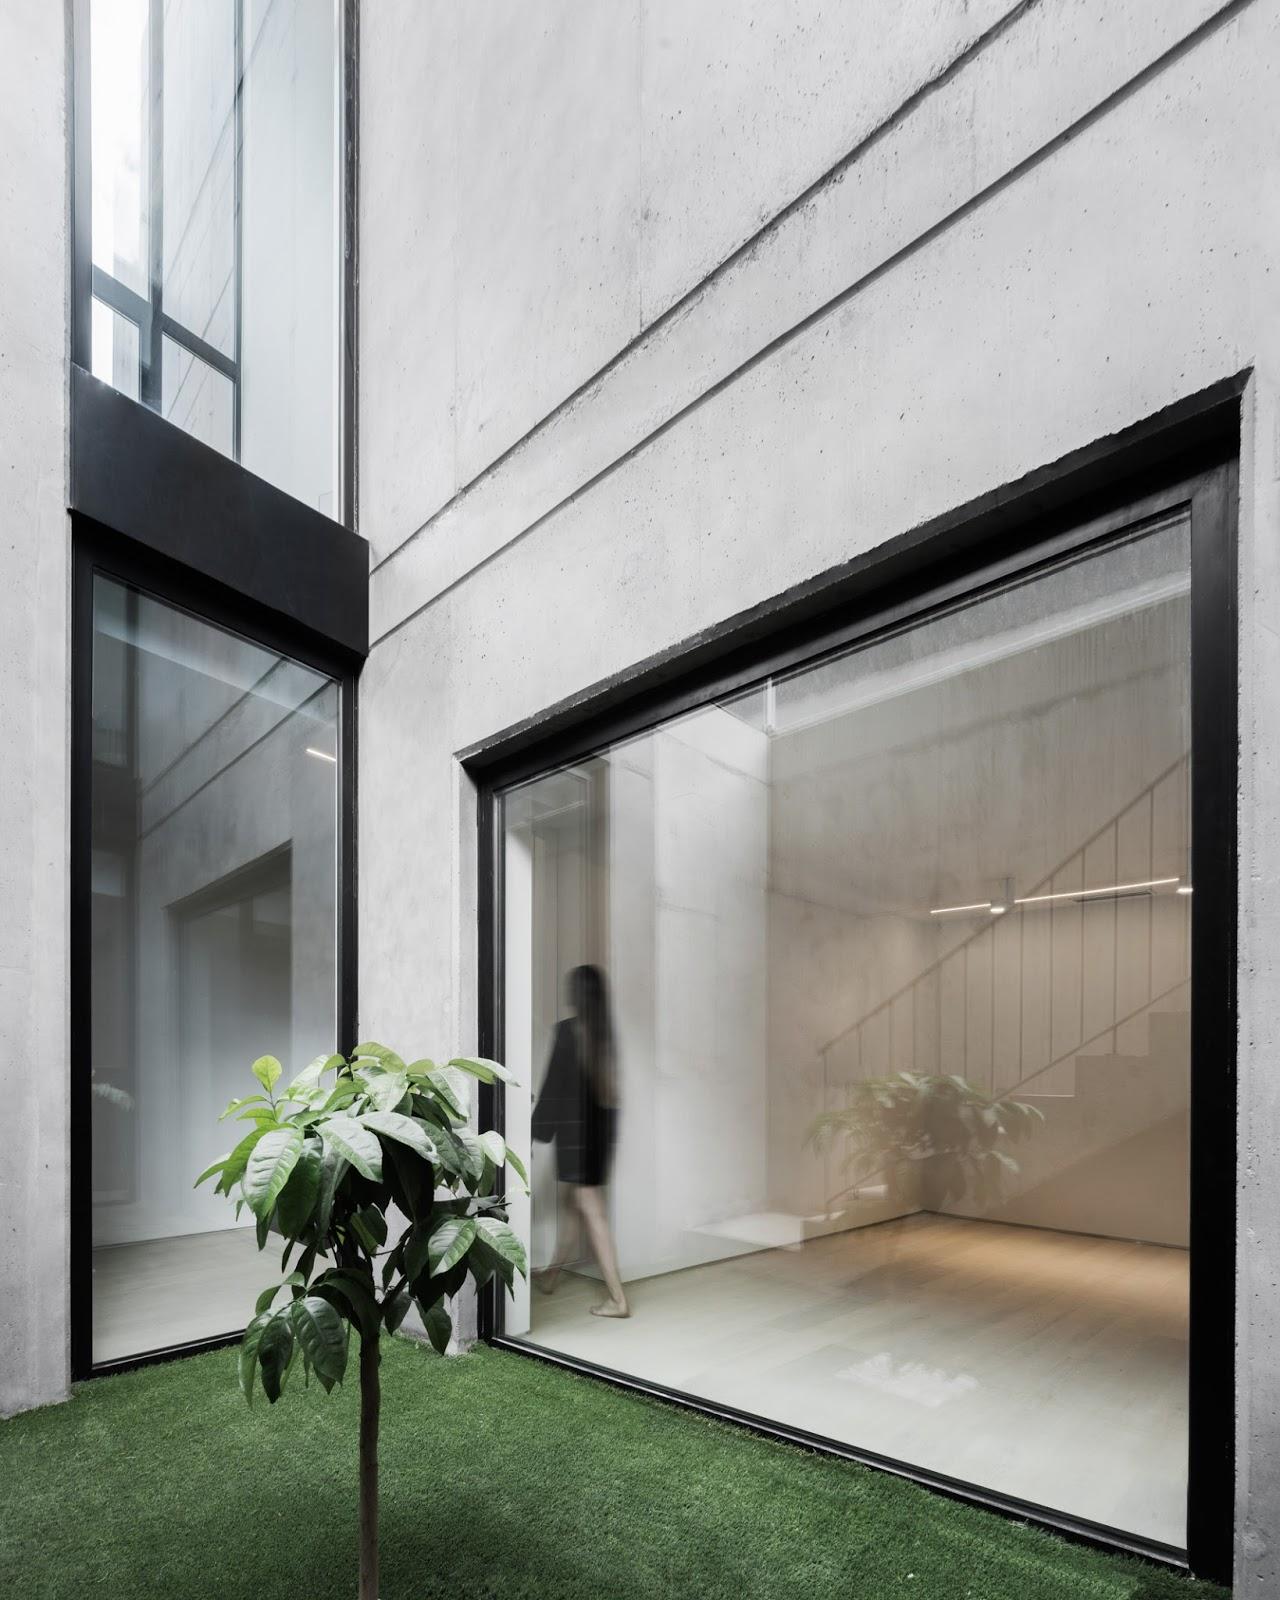 Ruben muedra estudio de arquitectura valencia - Estudios de arquitectura sevilla ...